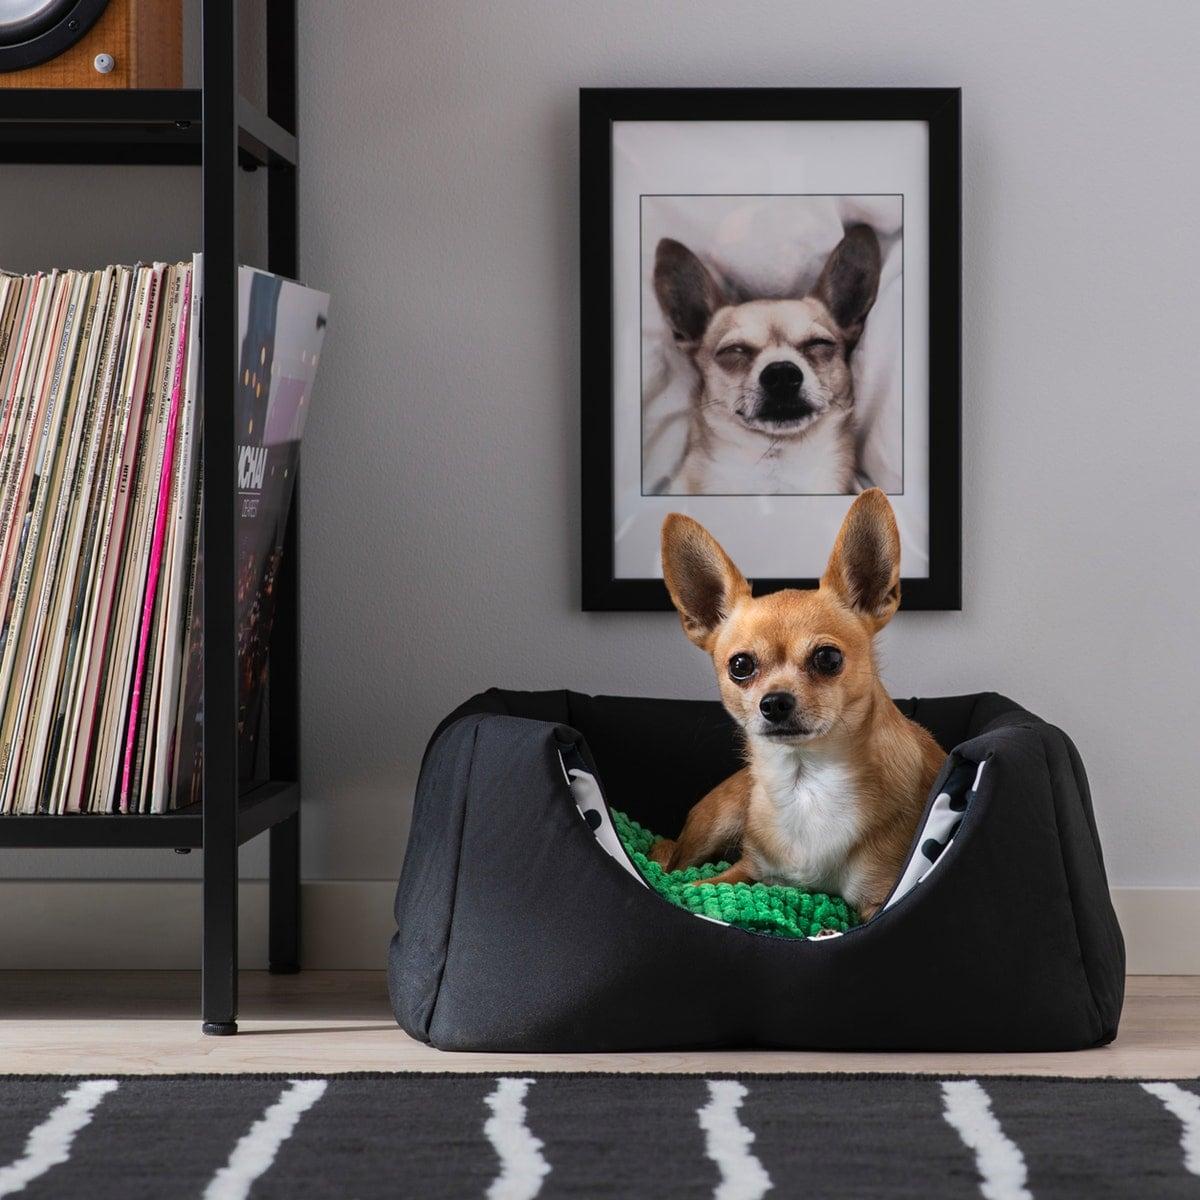 Para Accesorios Ikea Online Mascotas Compra qzpMSUVG